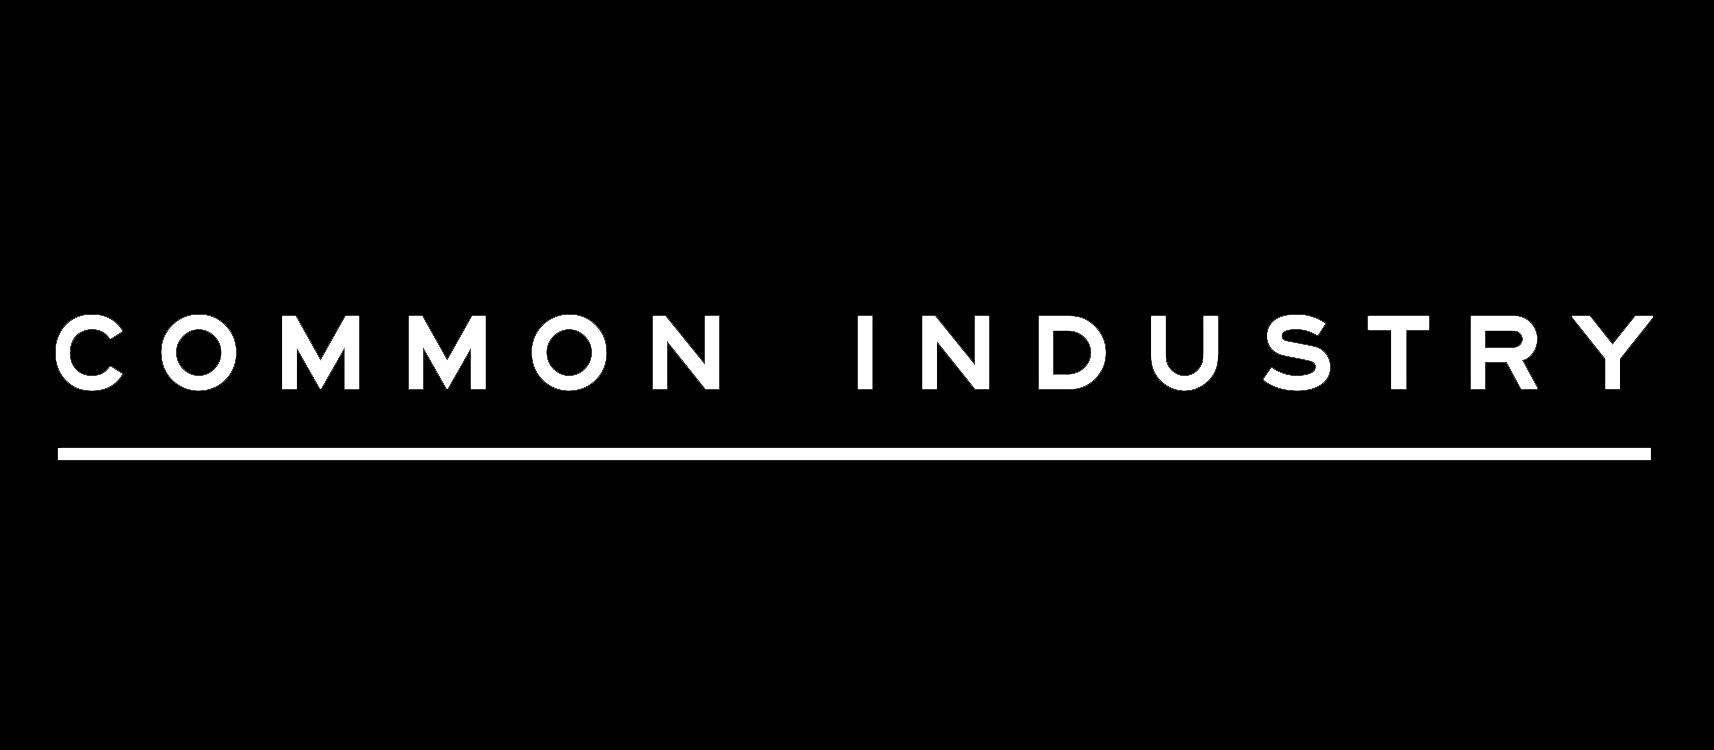 Common Industry logo - white on black (3)